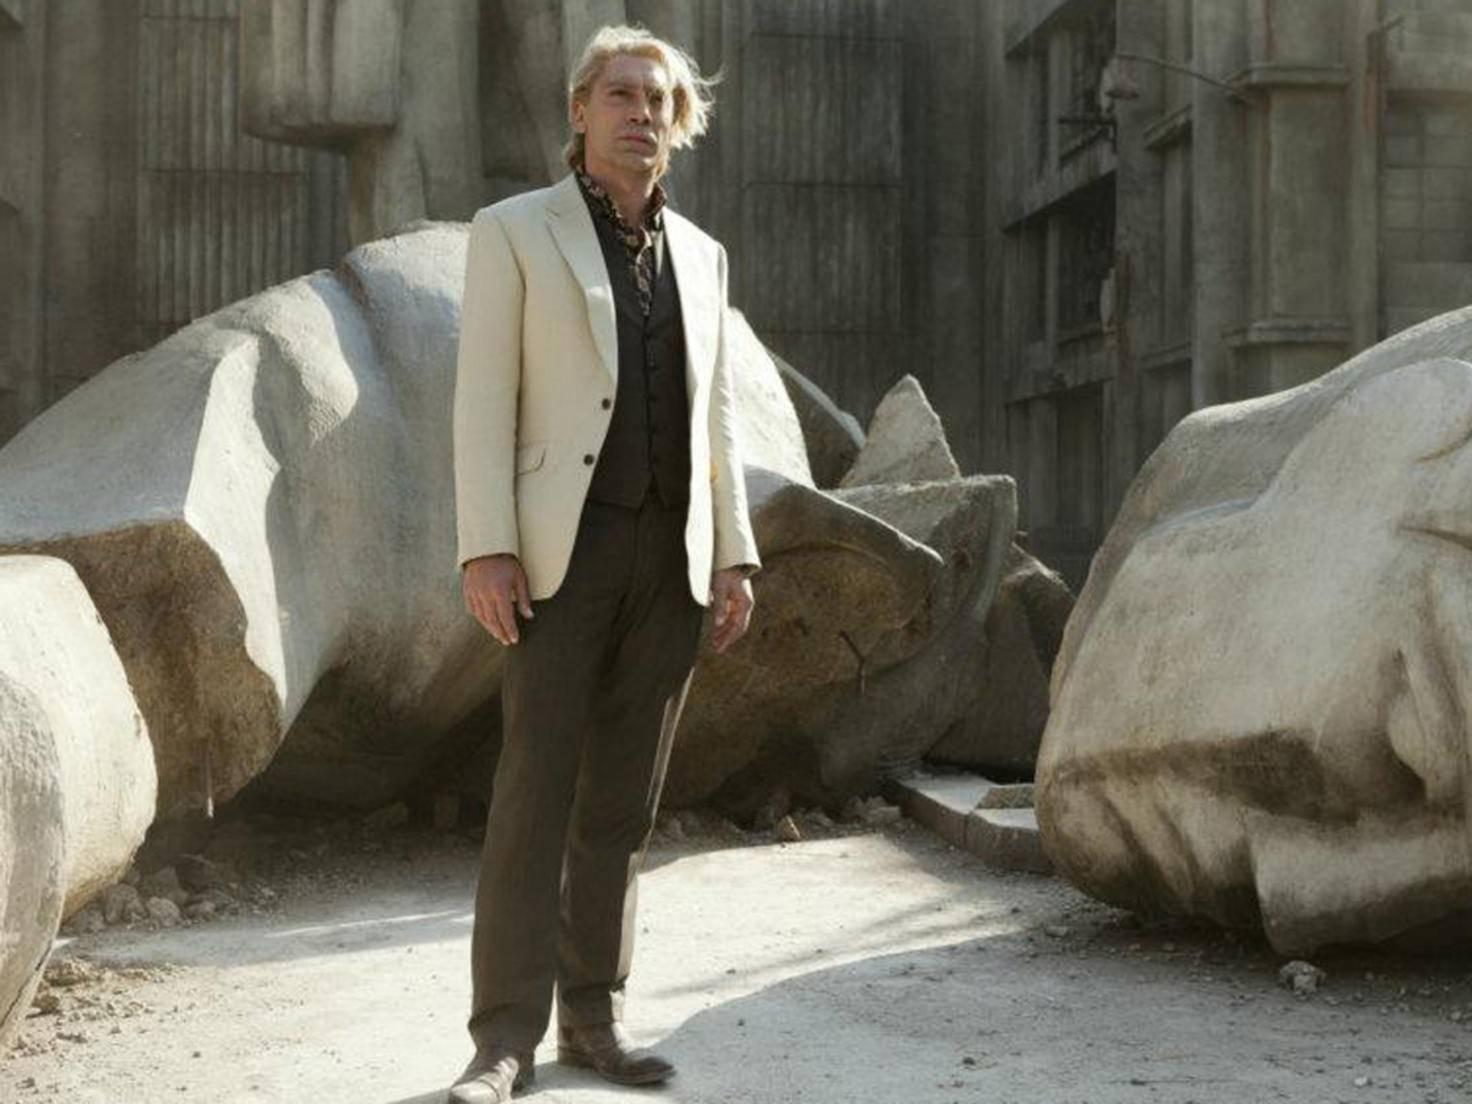 Javier Bardem spielt den vielschichtigen Raoul Silva.